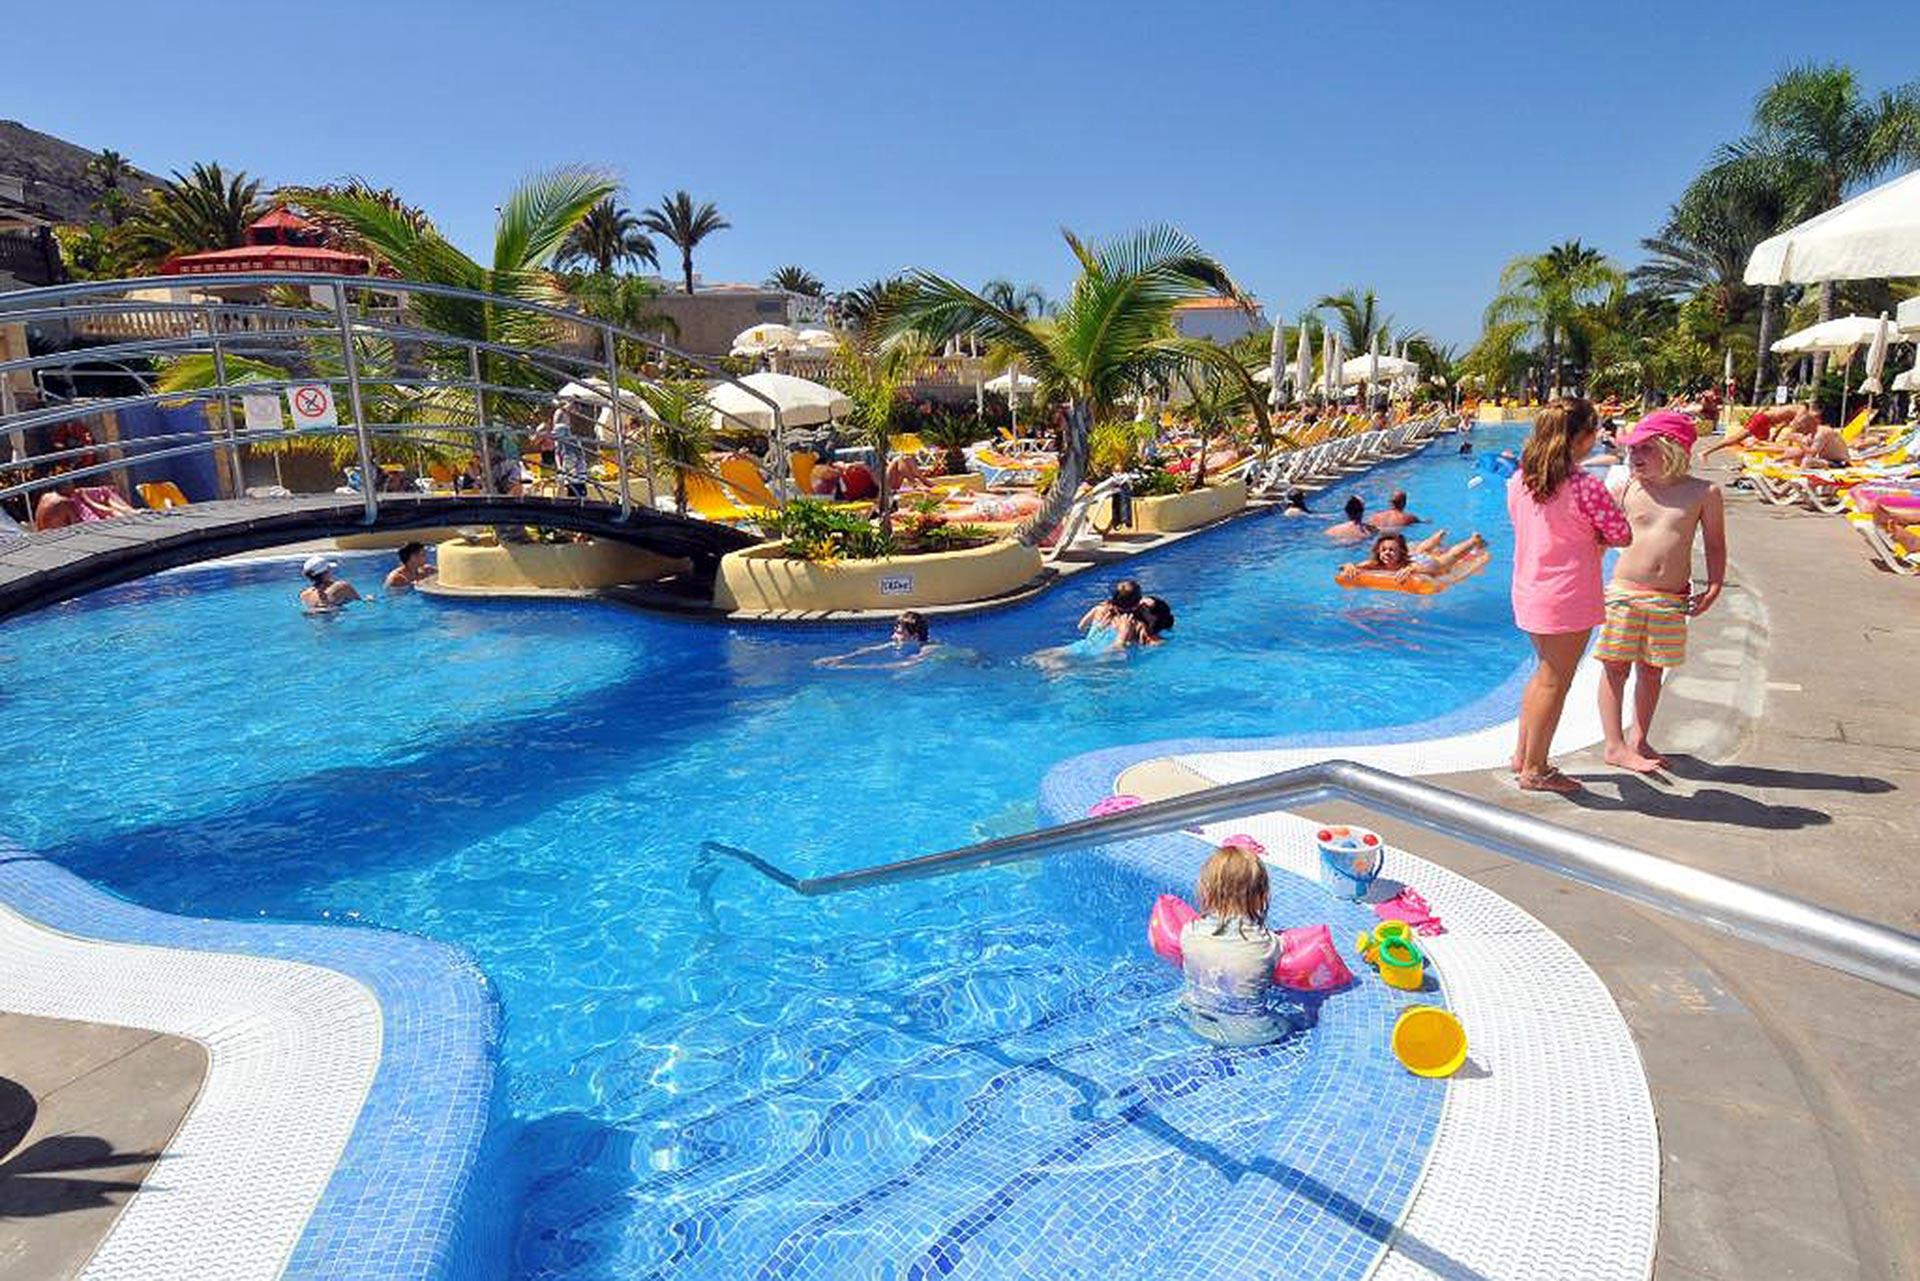 Paradise Park Fun LifeStyle Hotel, Tenerife, Spain